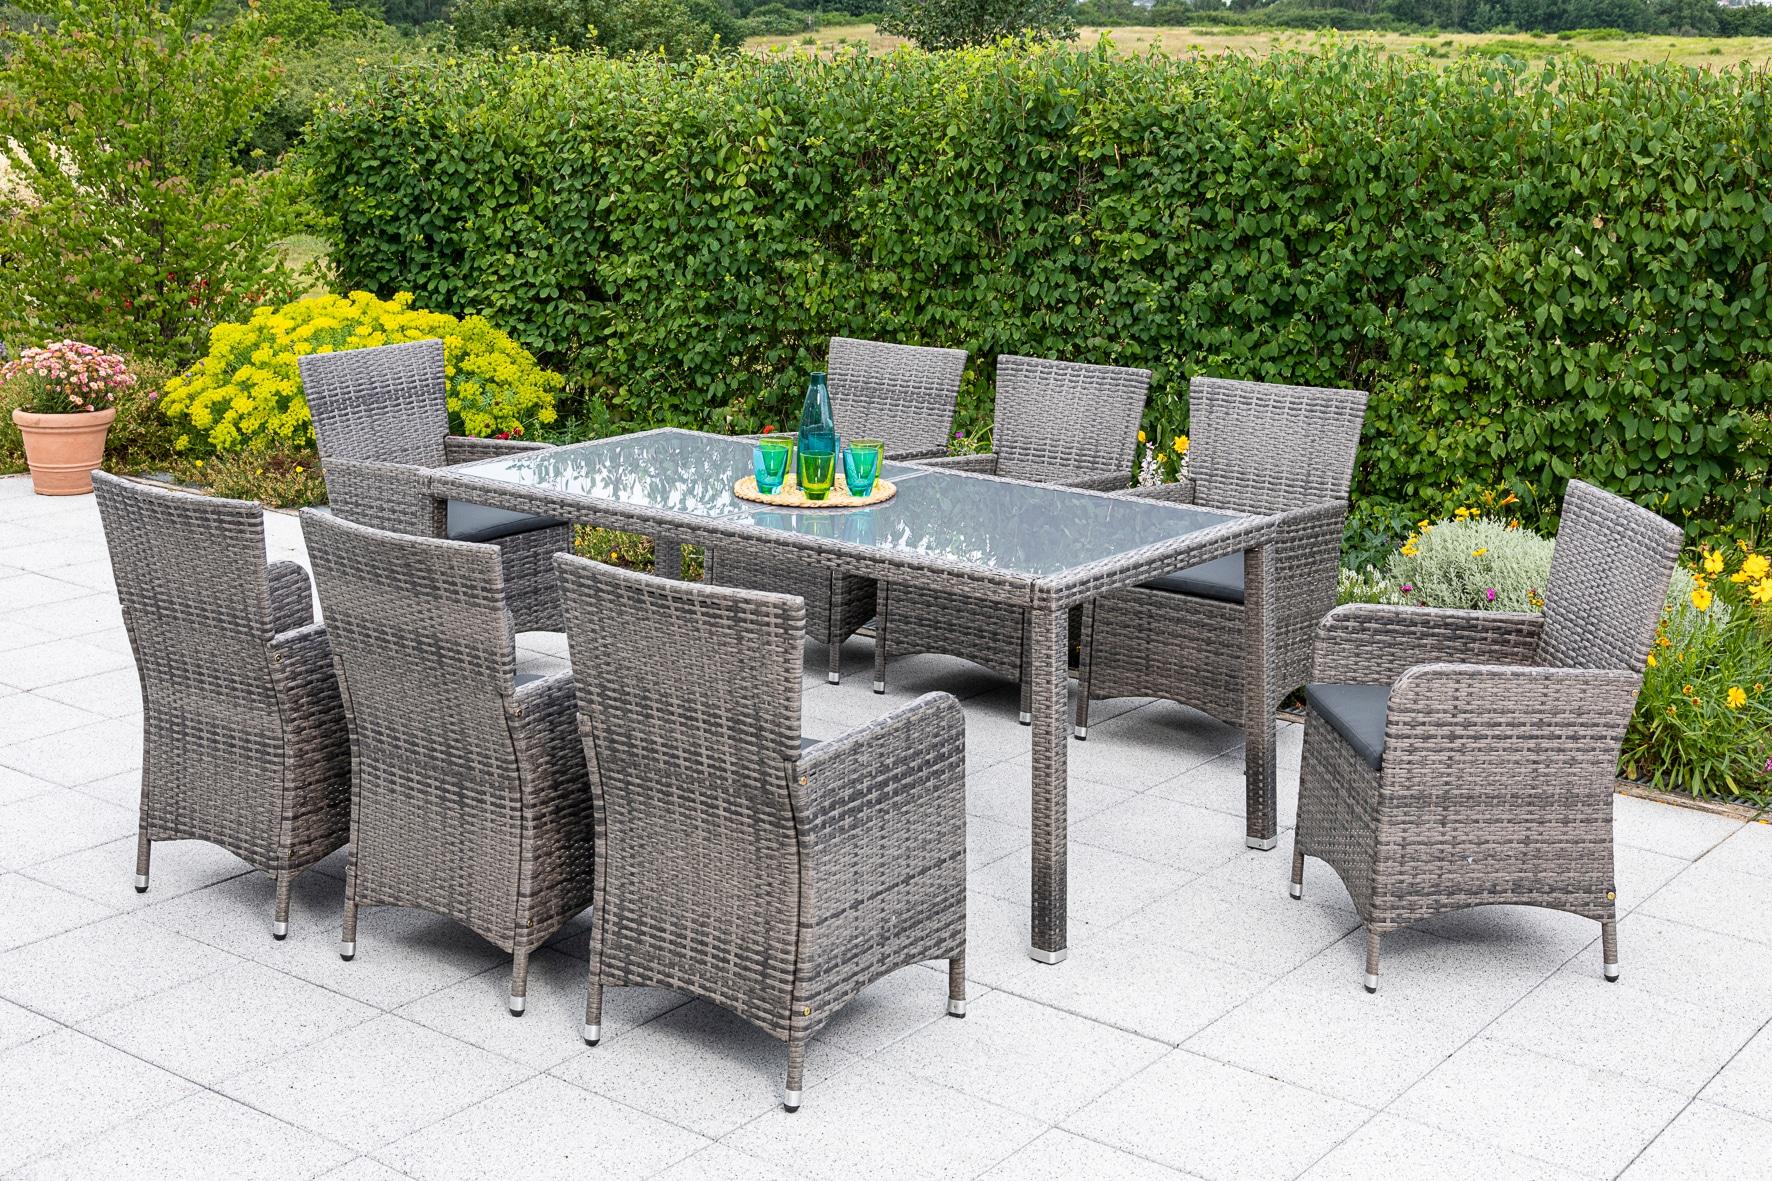 MERXX Diningset Lipari 17-tlg 8x Sessel Tisch 185x90 cm Polyrattan